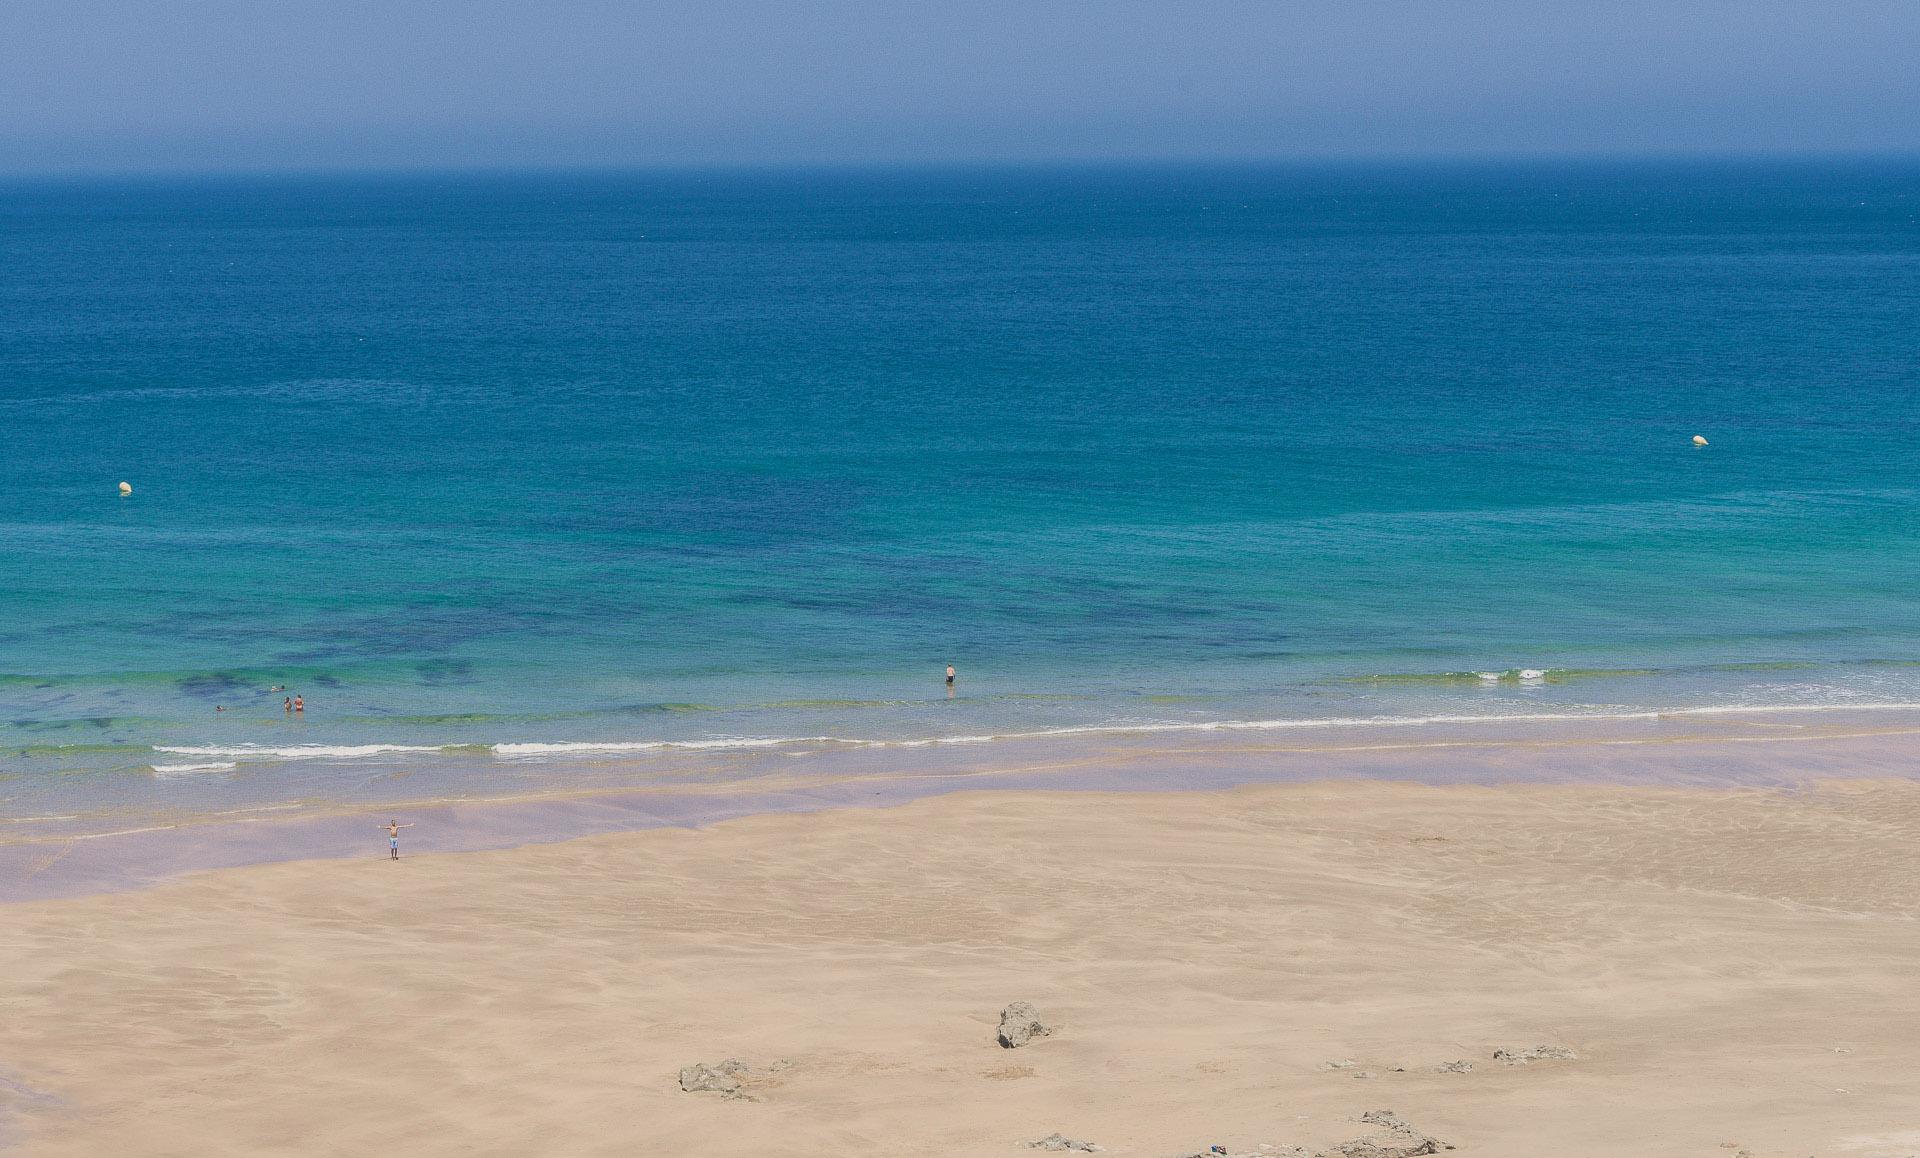 Kenitra Gharb Chrarda Beni Hssen Morocco boukmour beach, sauvage, rabat-salé-kénitra, morocco